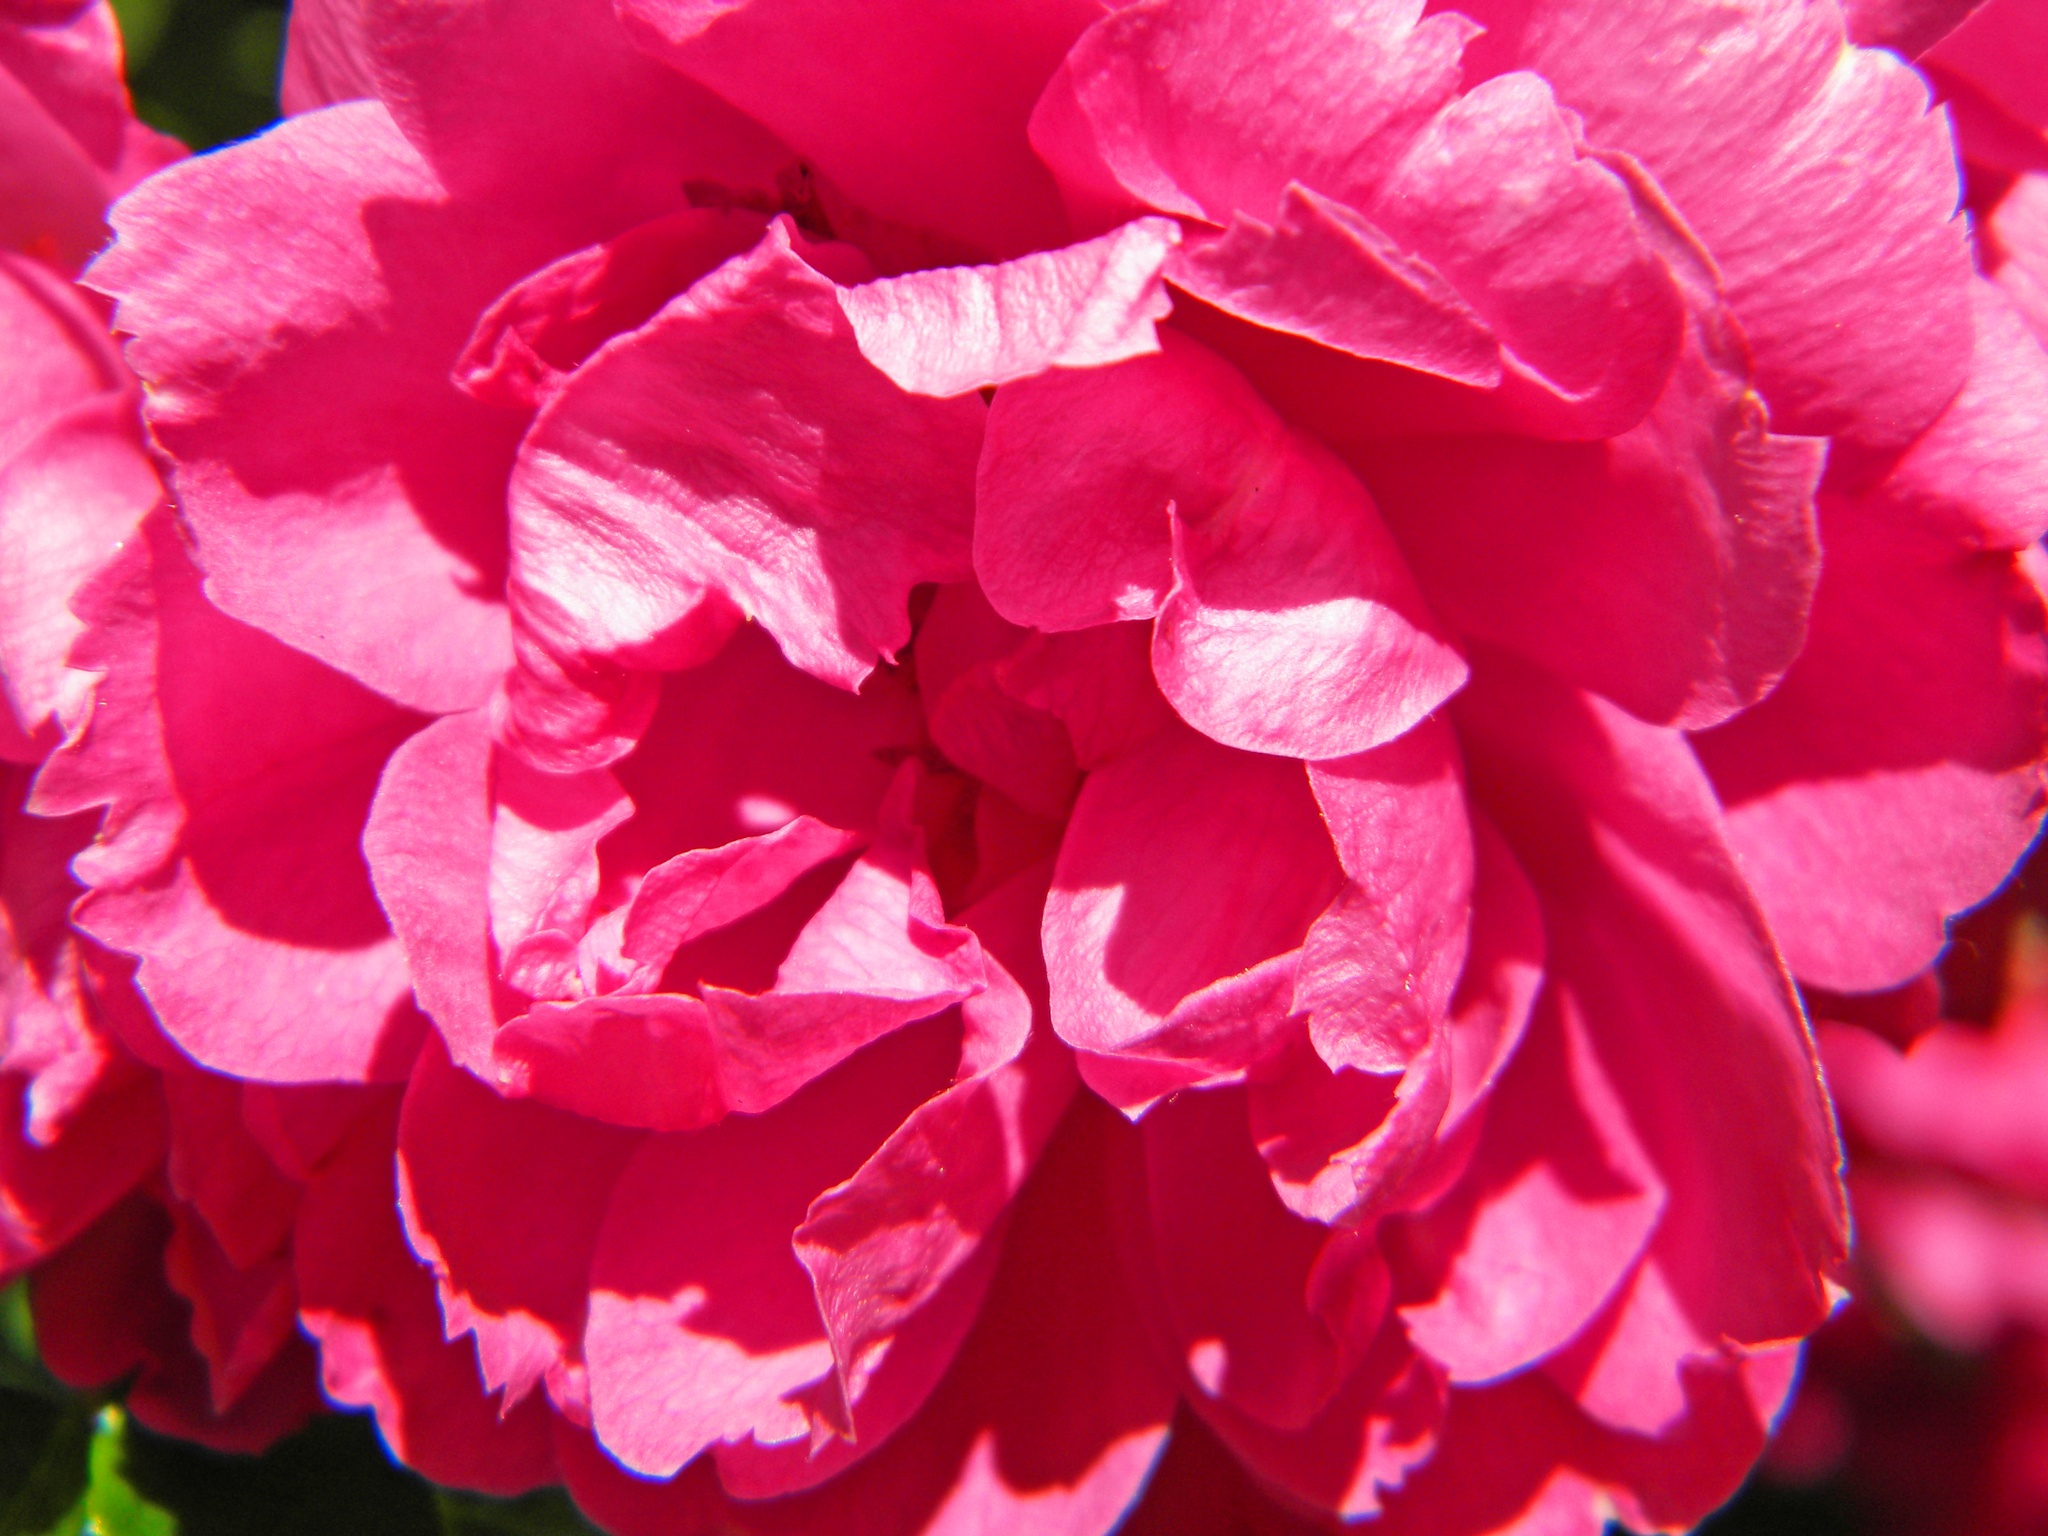 Pretty In Pink by Phillip W. Strunk